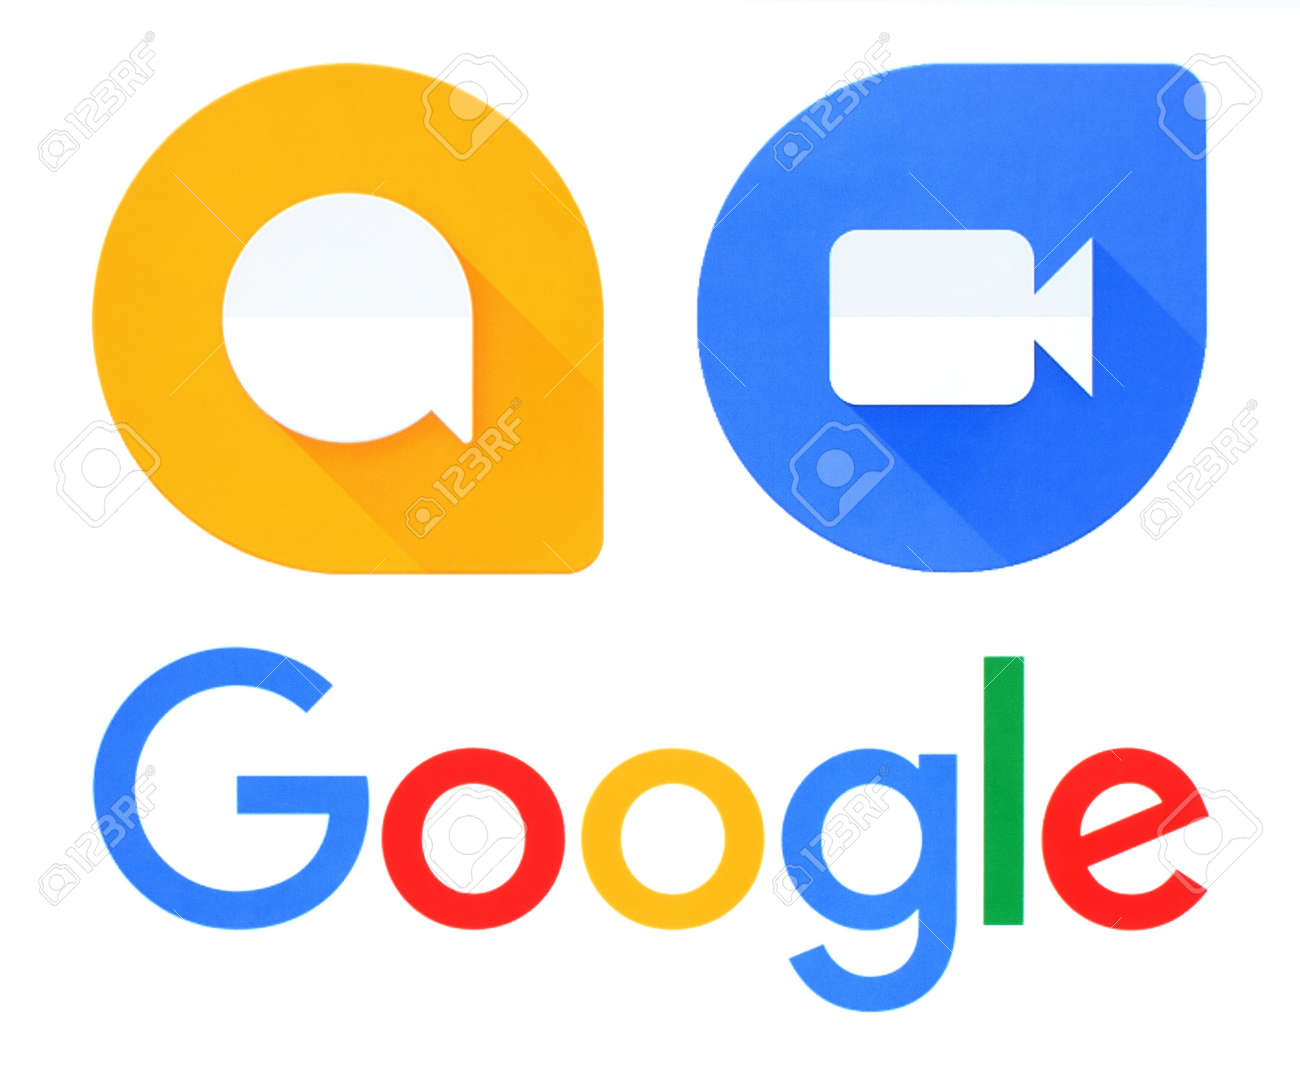 Kiev, Ukraine - September 21, 2016: Google, Allo and Duo logos